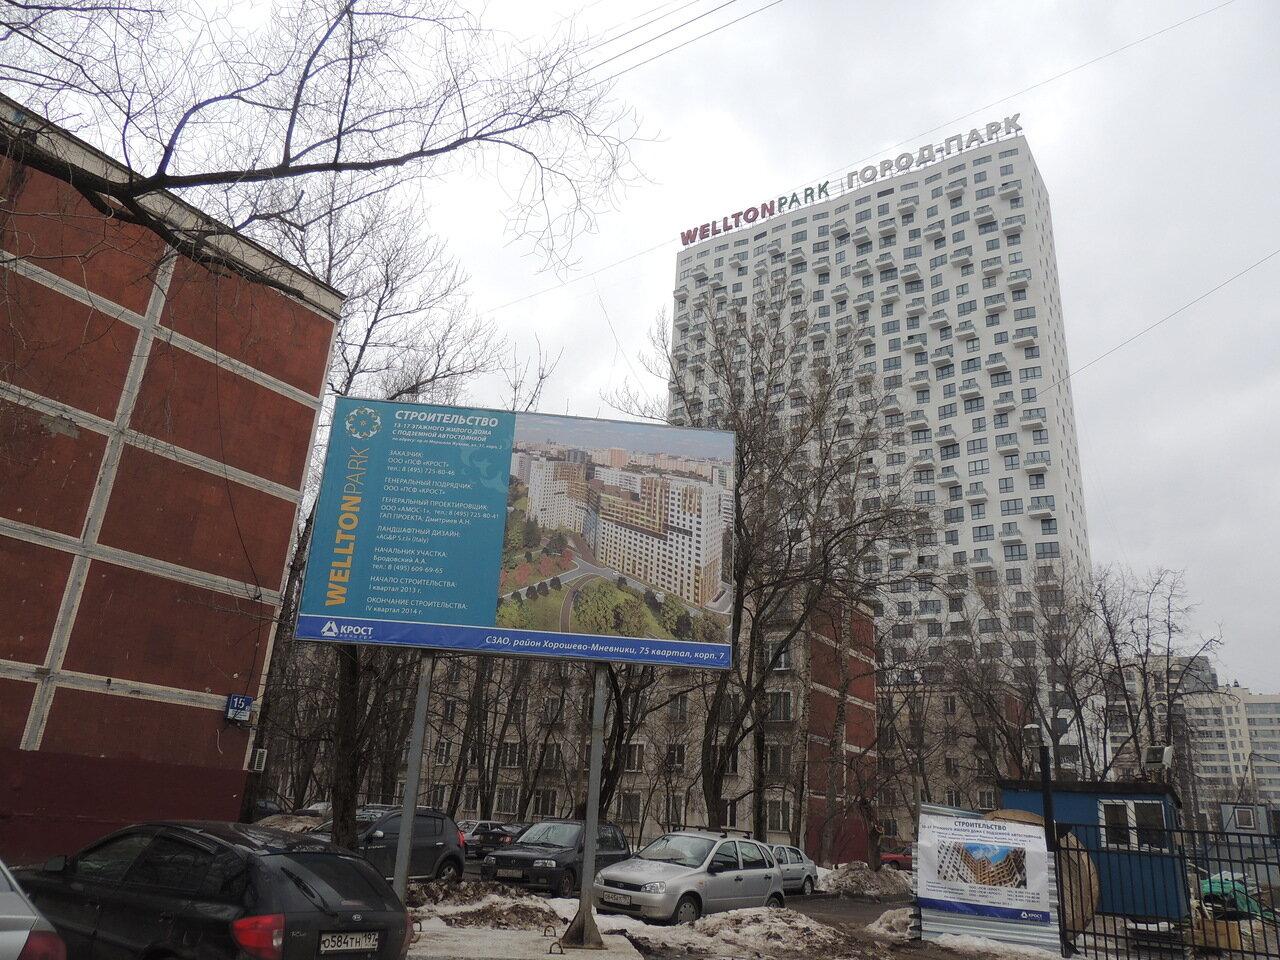 http://img-fotki.yandex.ru/get/5634/8217593.13/0_9763e_ed097603_XXXL.jpg